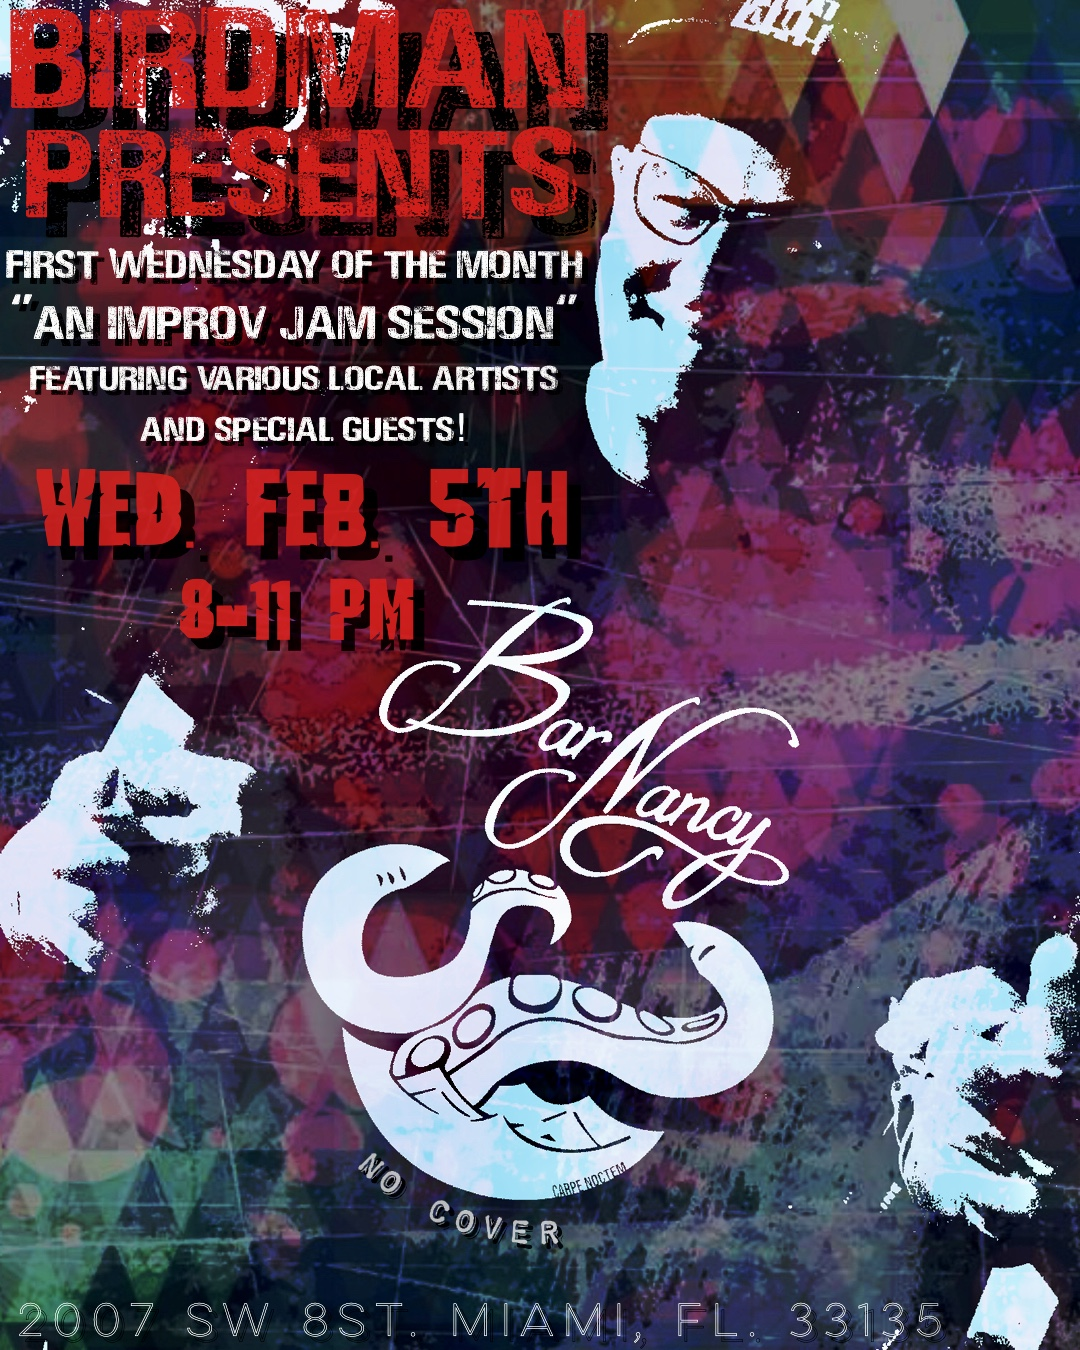 Birdman Presents! Jam with the Clam! 1st Wednesday's! @ Bar Nancy